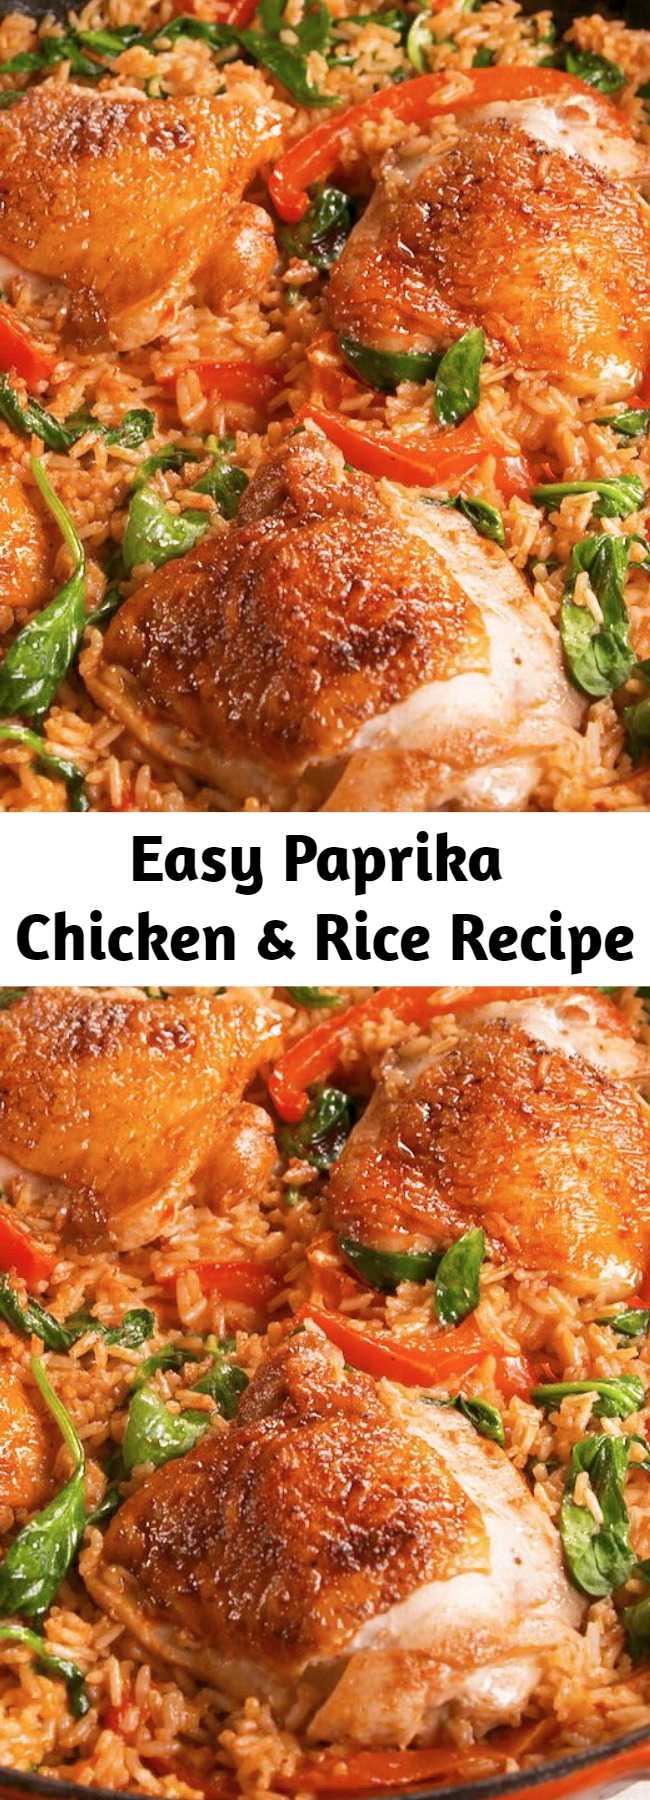 Easy Paprika Chicken & Rice Recipe - Weeknight dinner all-star. #food #easyrecipe #dinner #familydinner #chicken